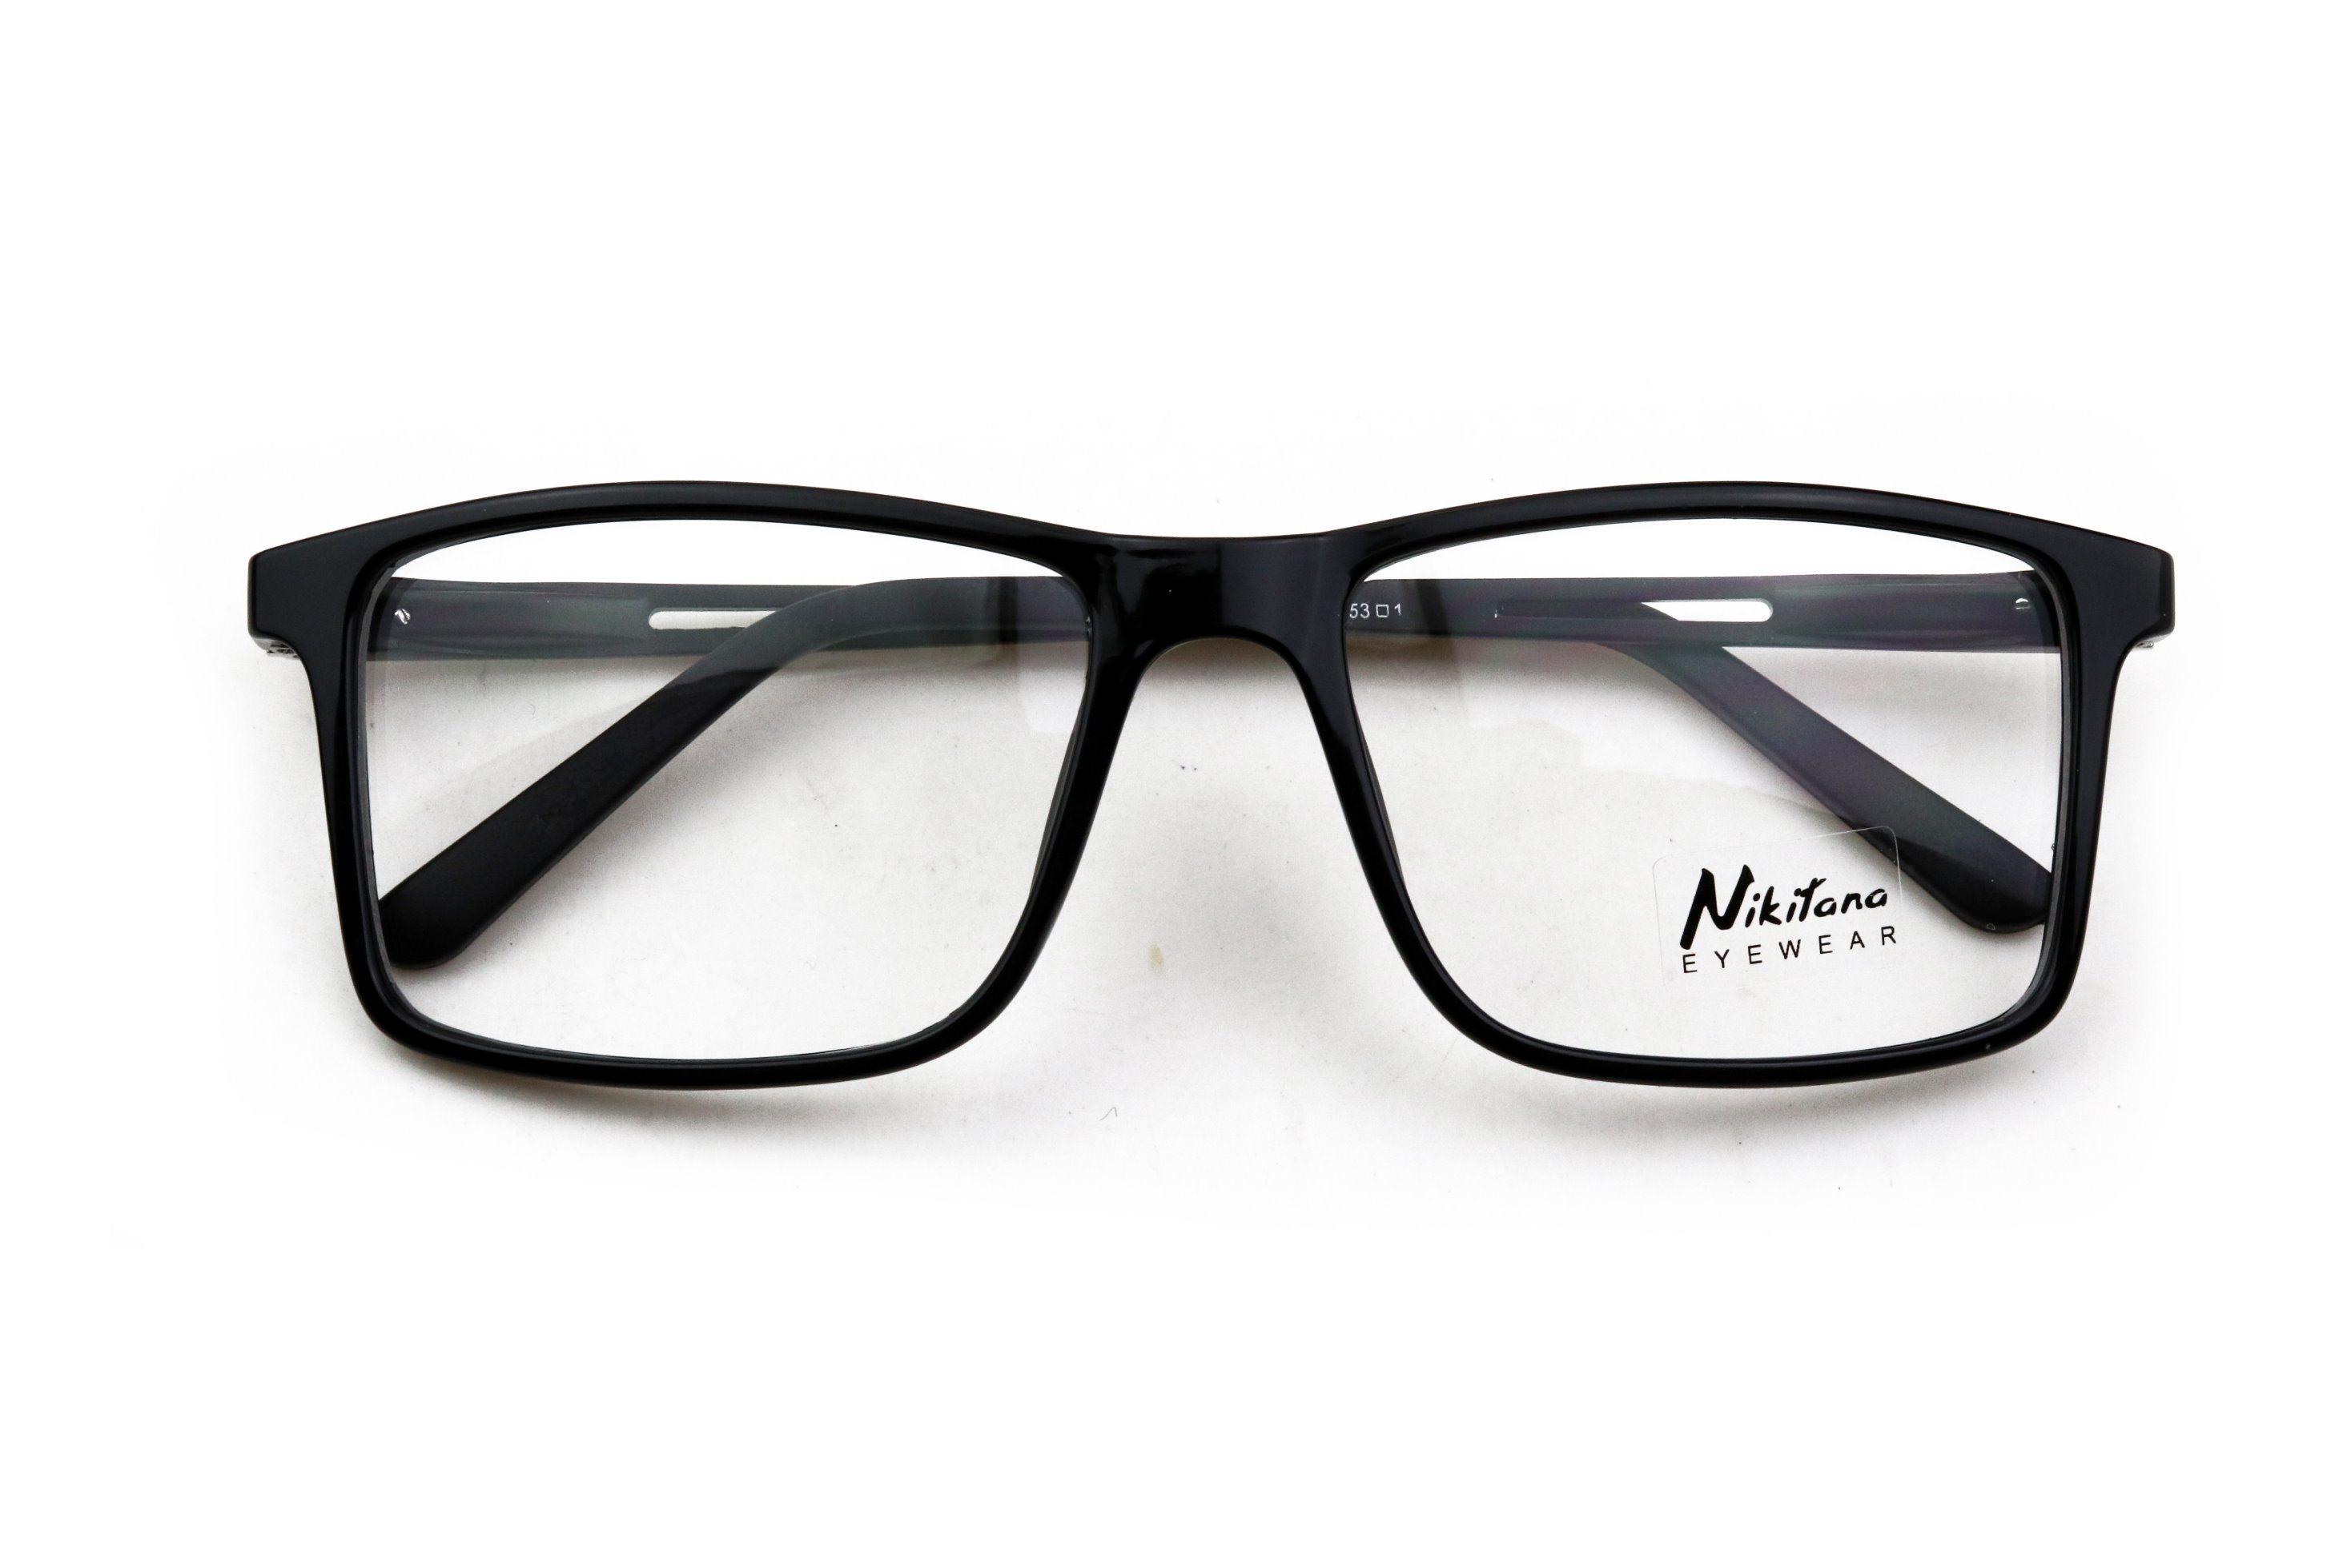 7e866a3657f China Supper Light Tr90 Frame Optical - China Full Frame Glasses ...